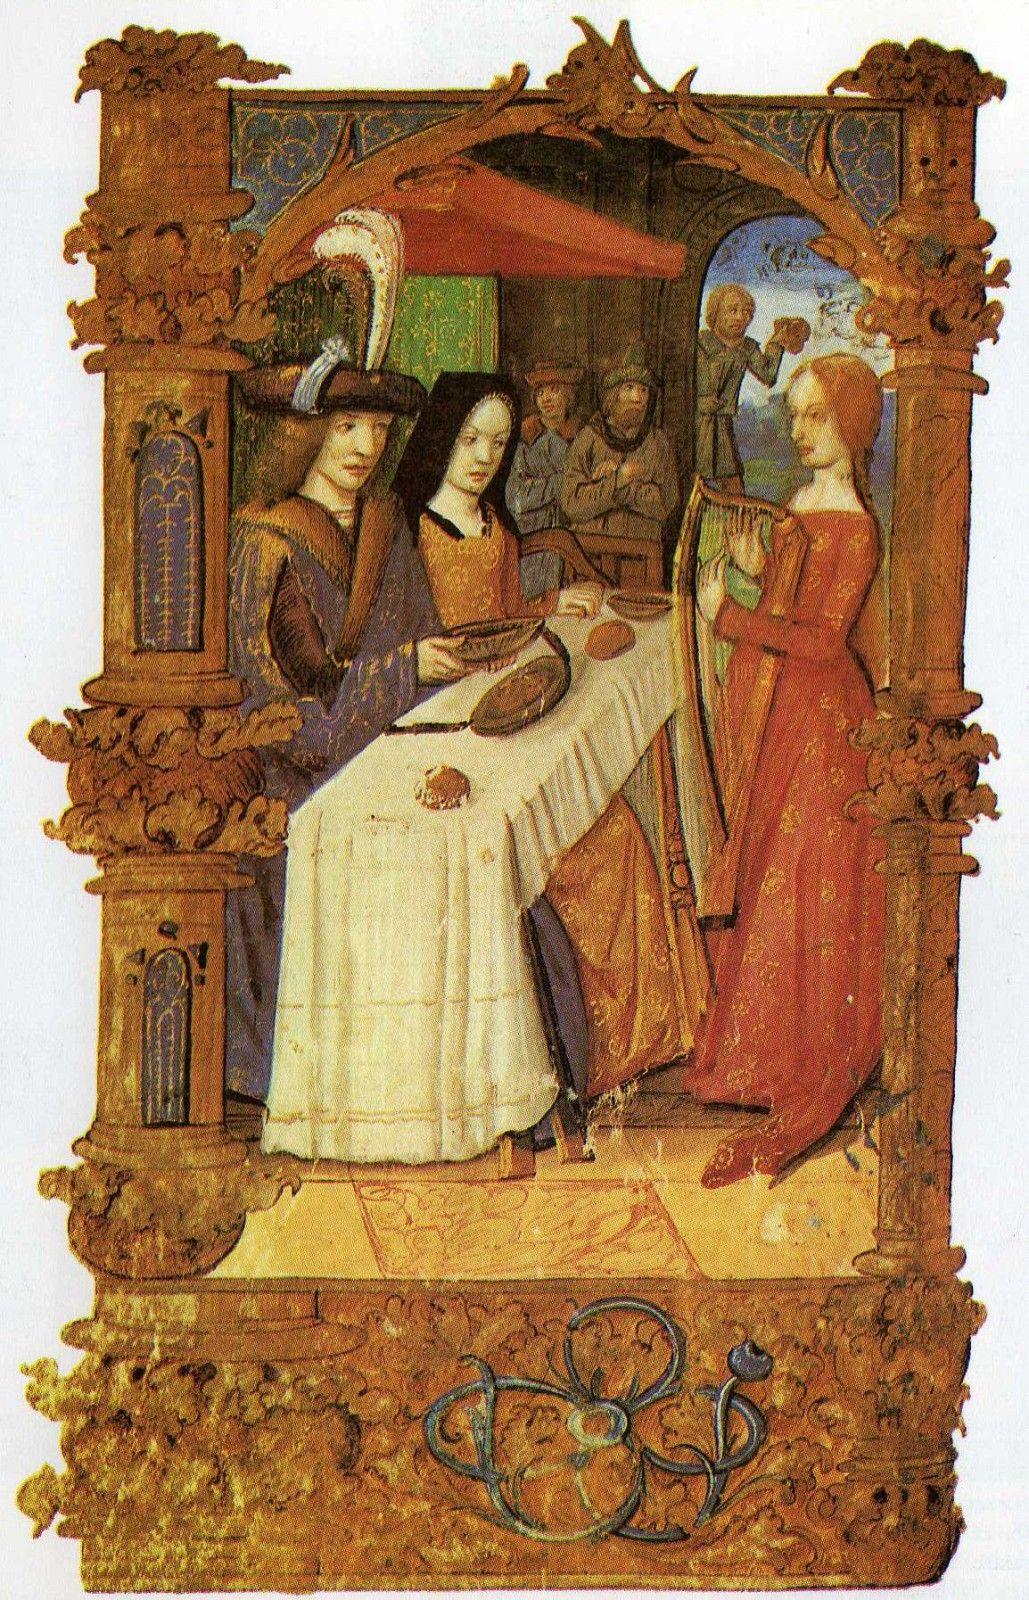 Afficher l'image d'origine | Femme artiste, Artiste, Moyen age